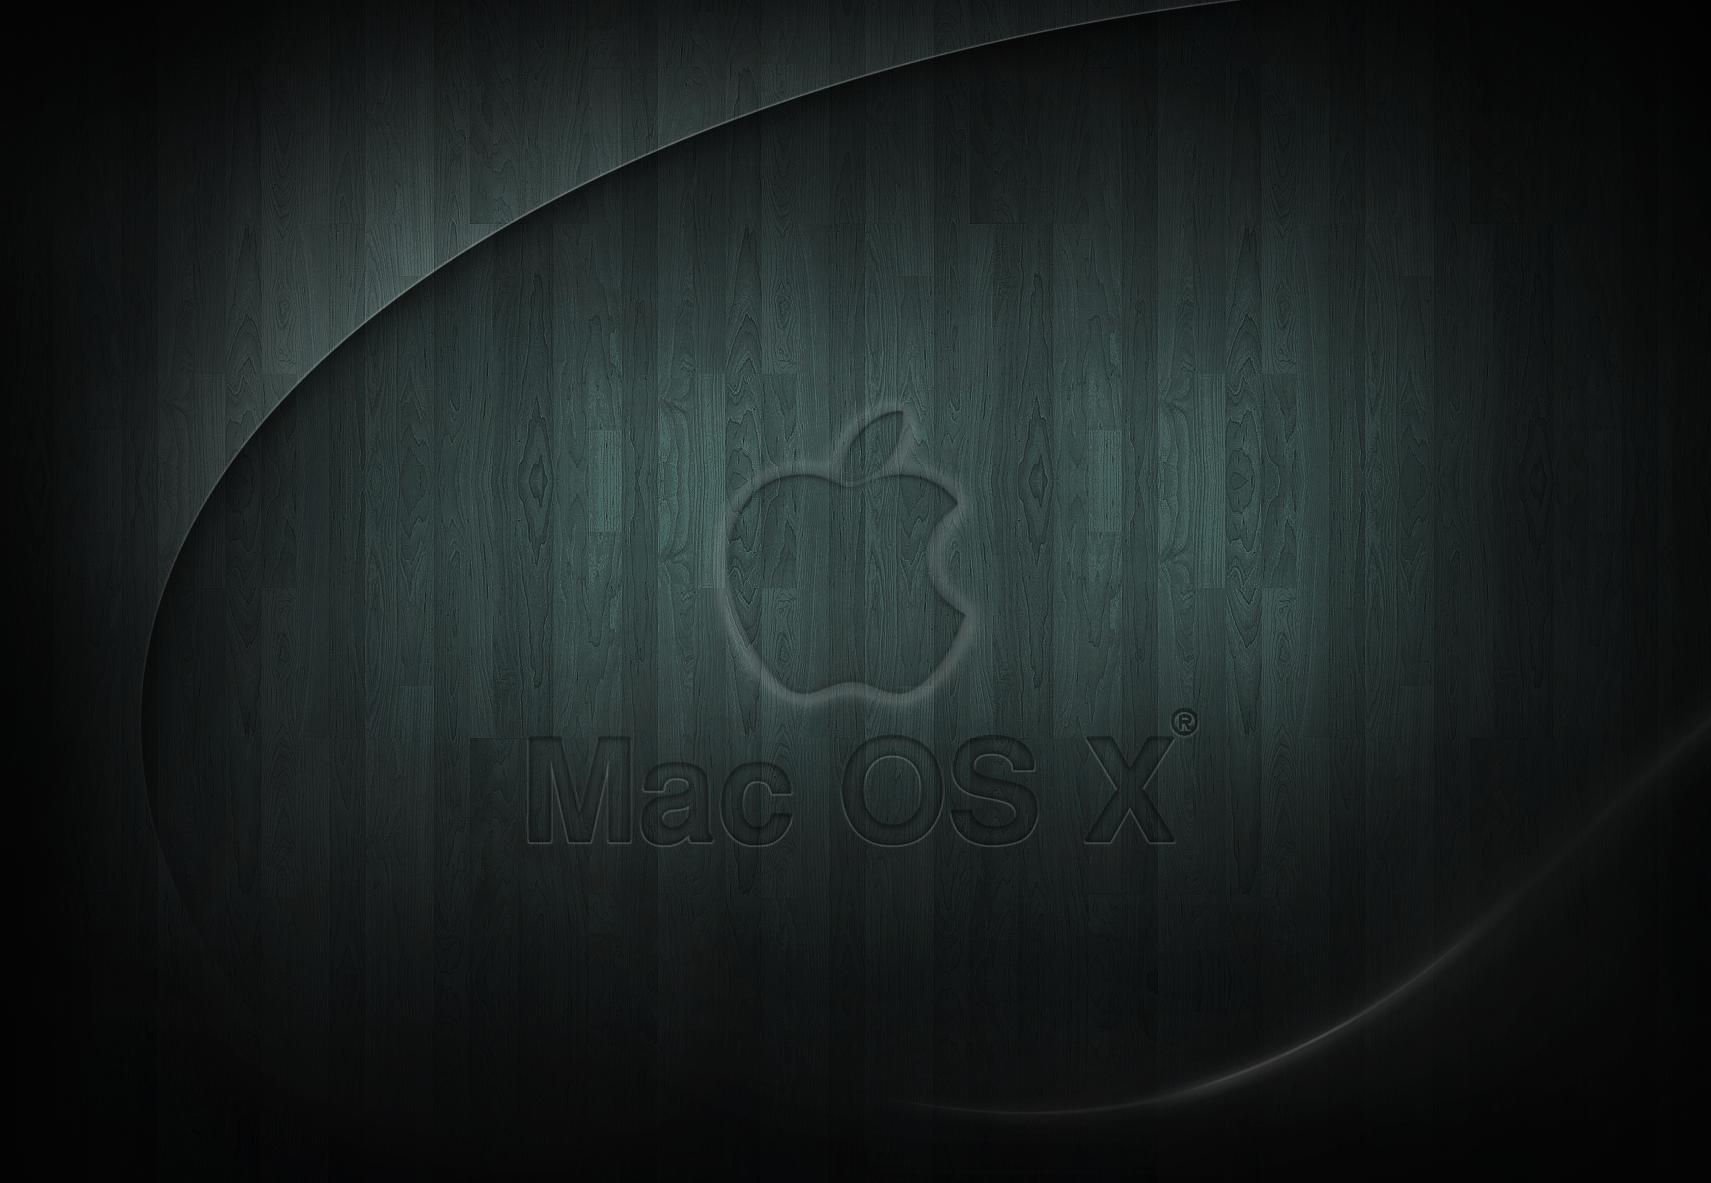 Wallpapers for Mac Wallpaper For Mac 1711x1183